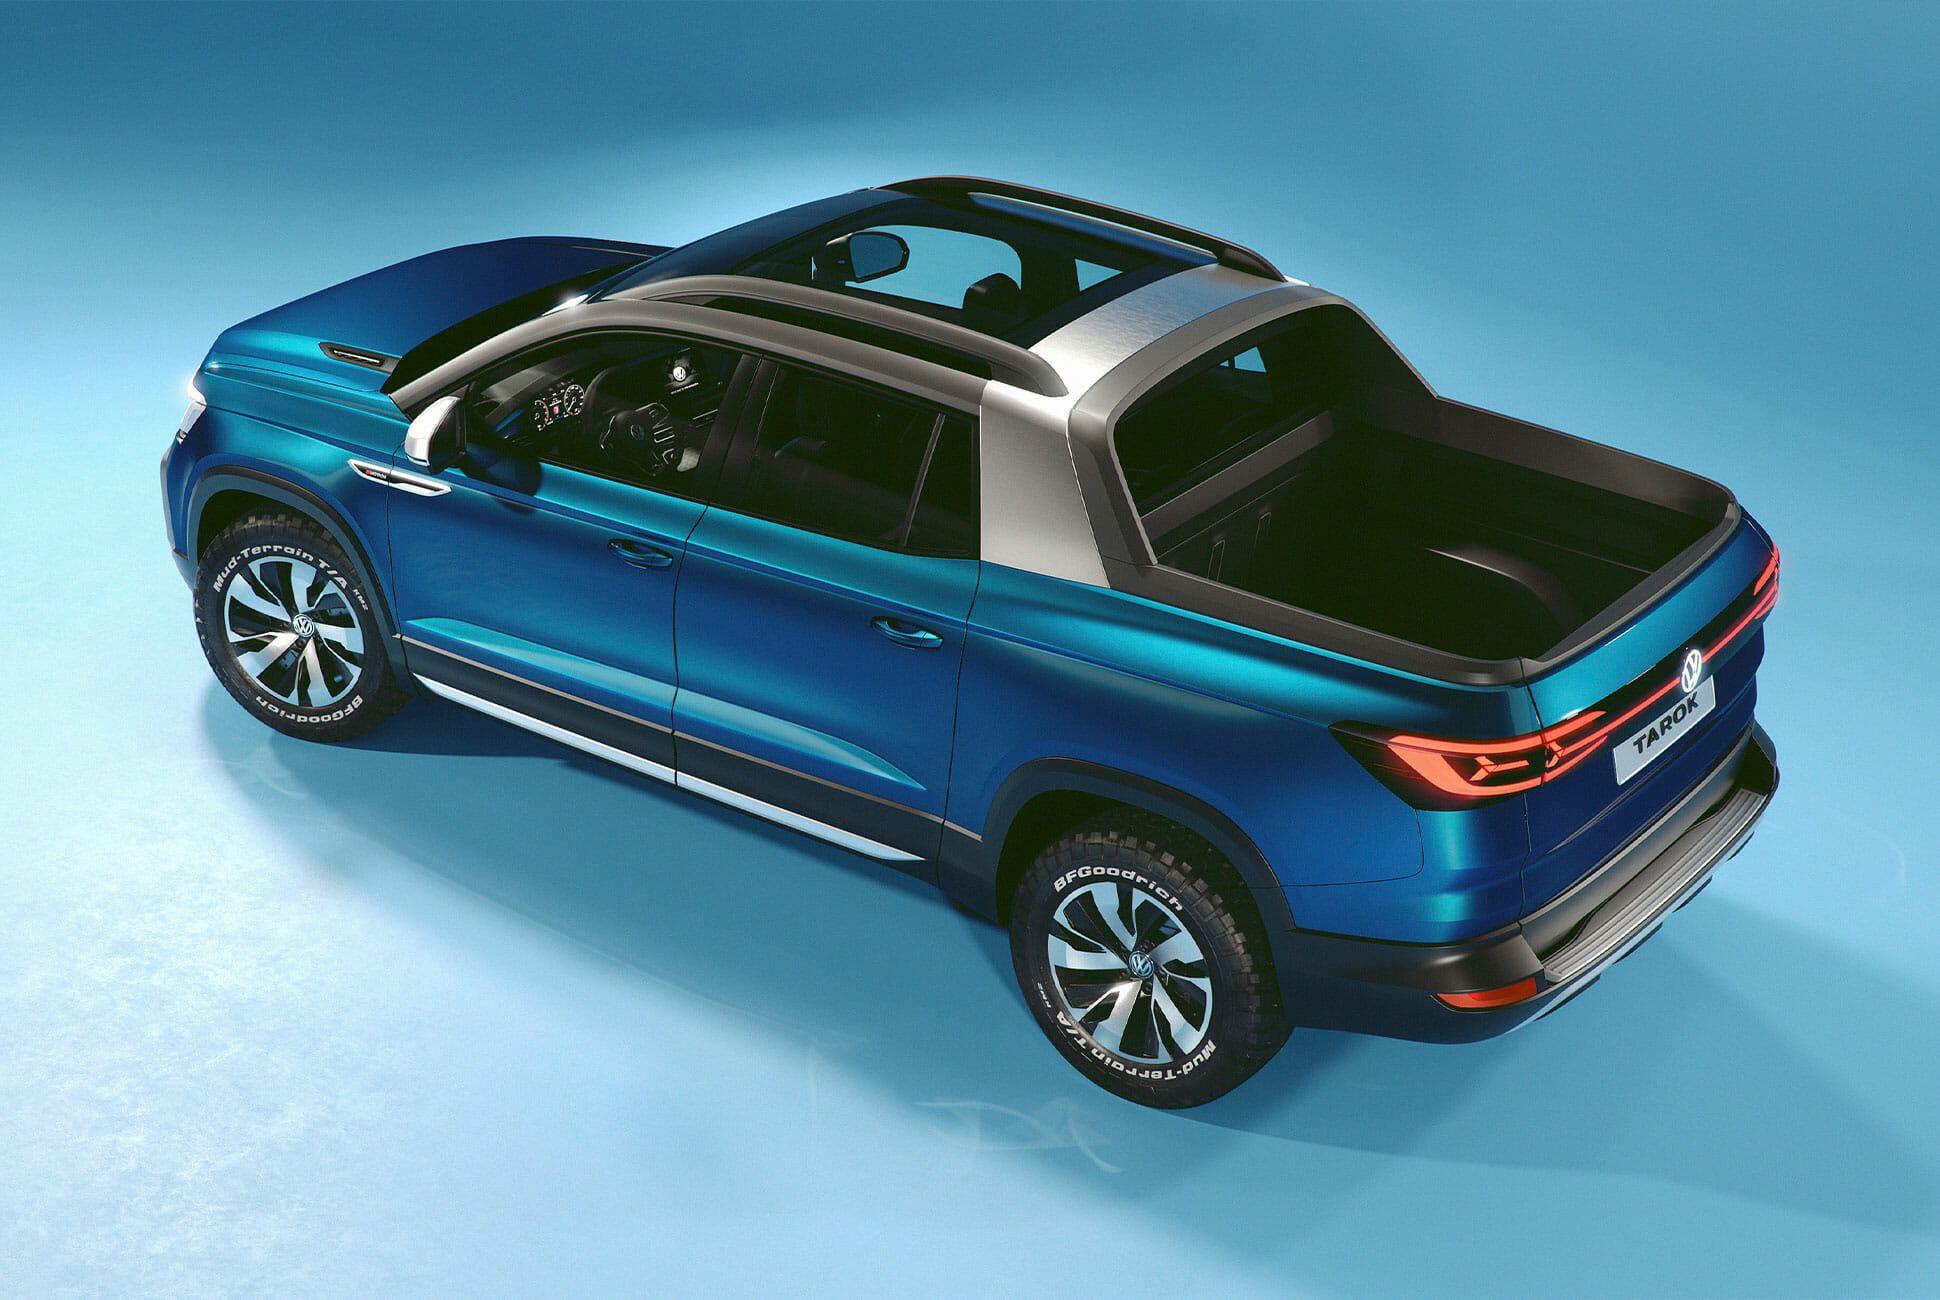 VW-Tarok-Gear-Patrol-Slide-2